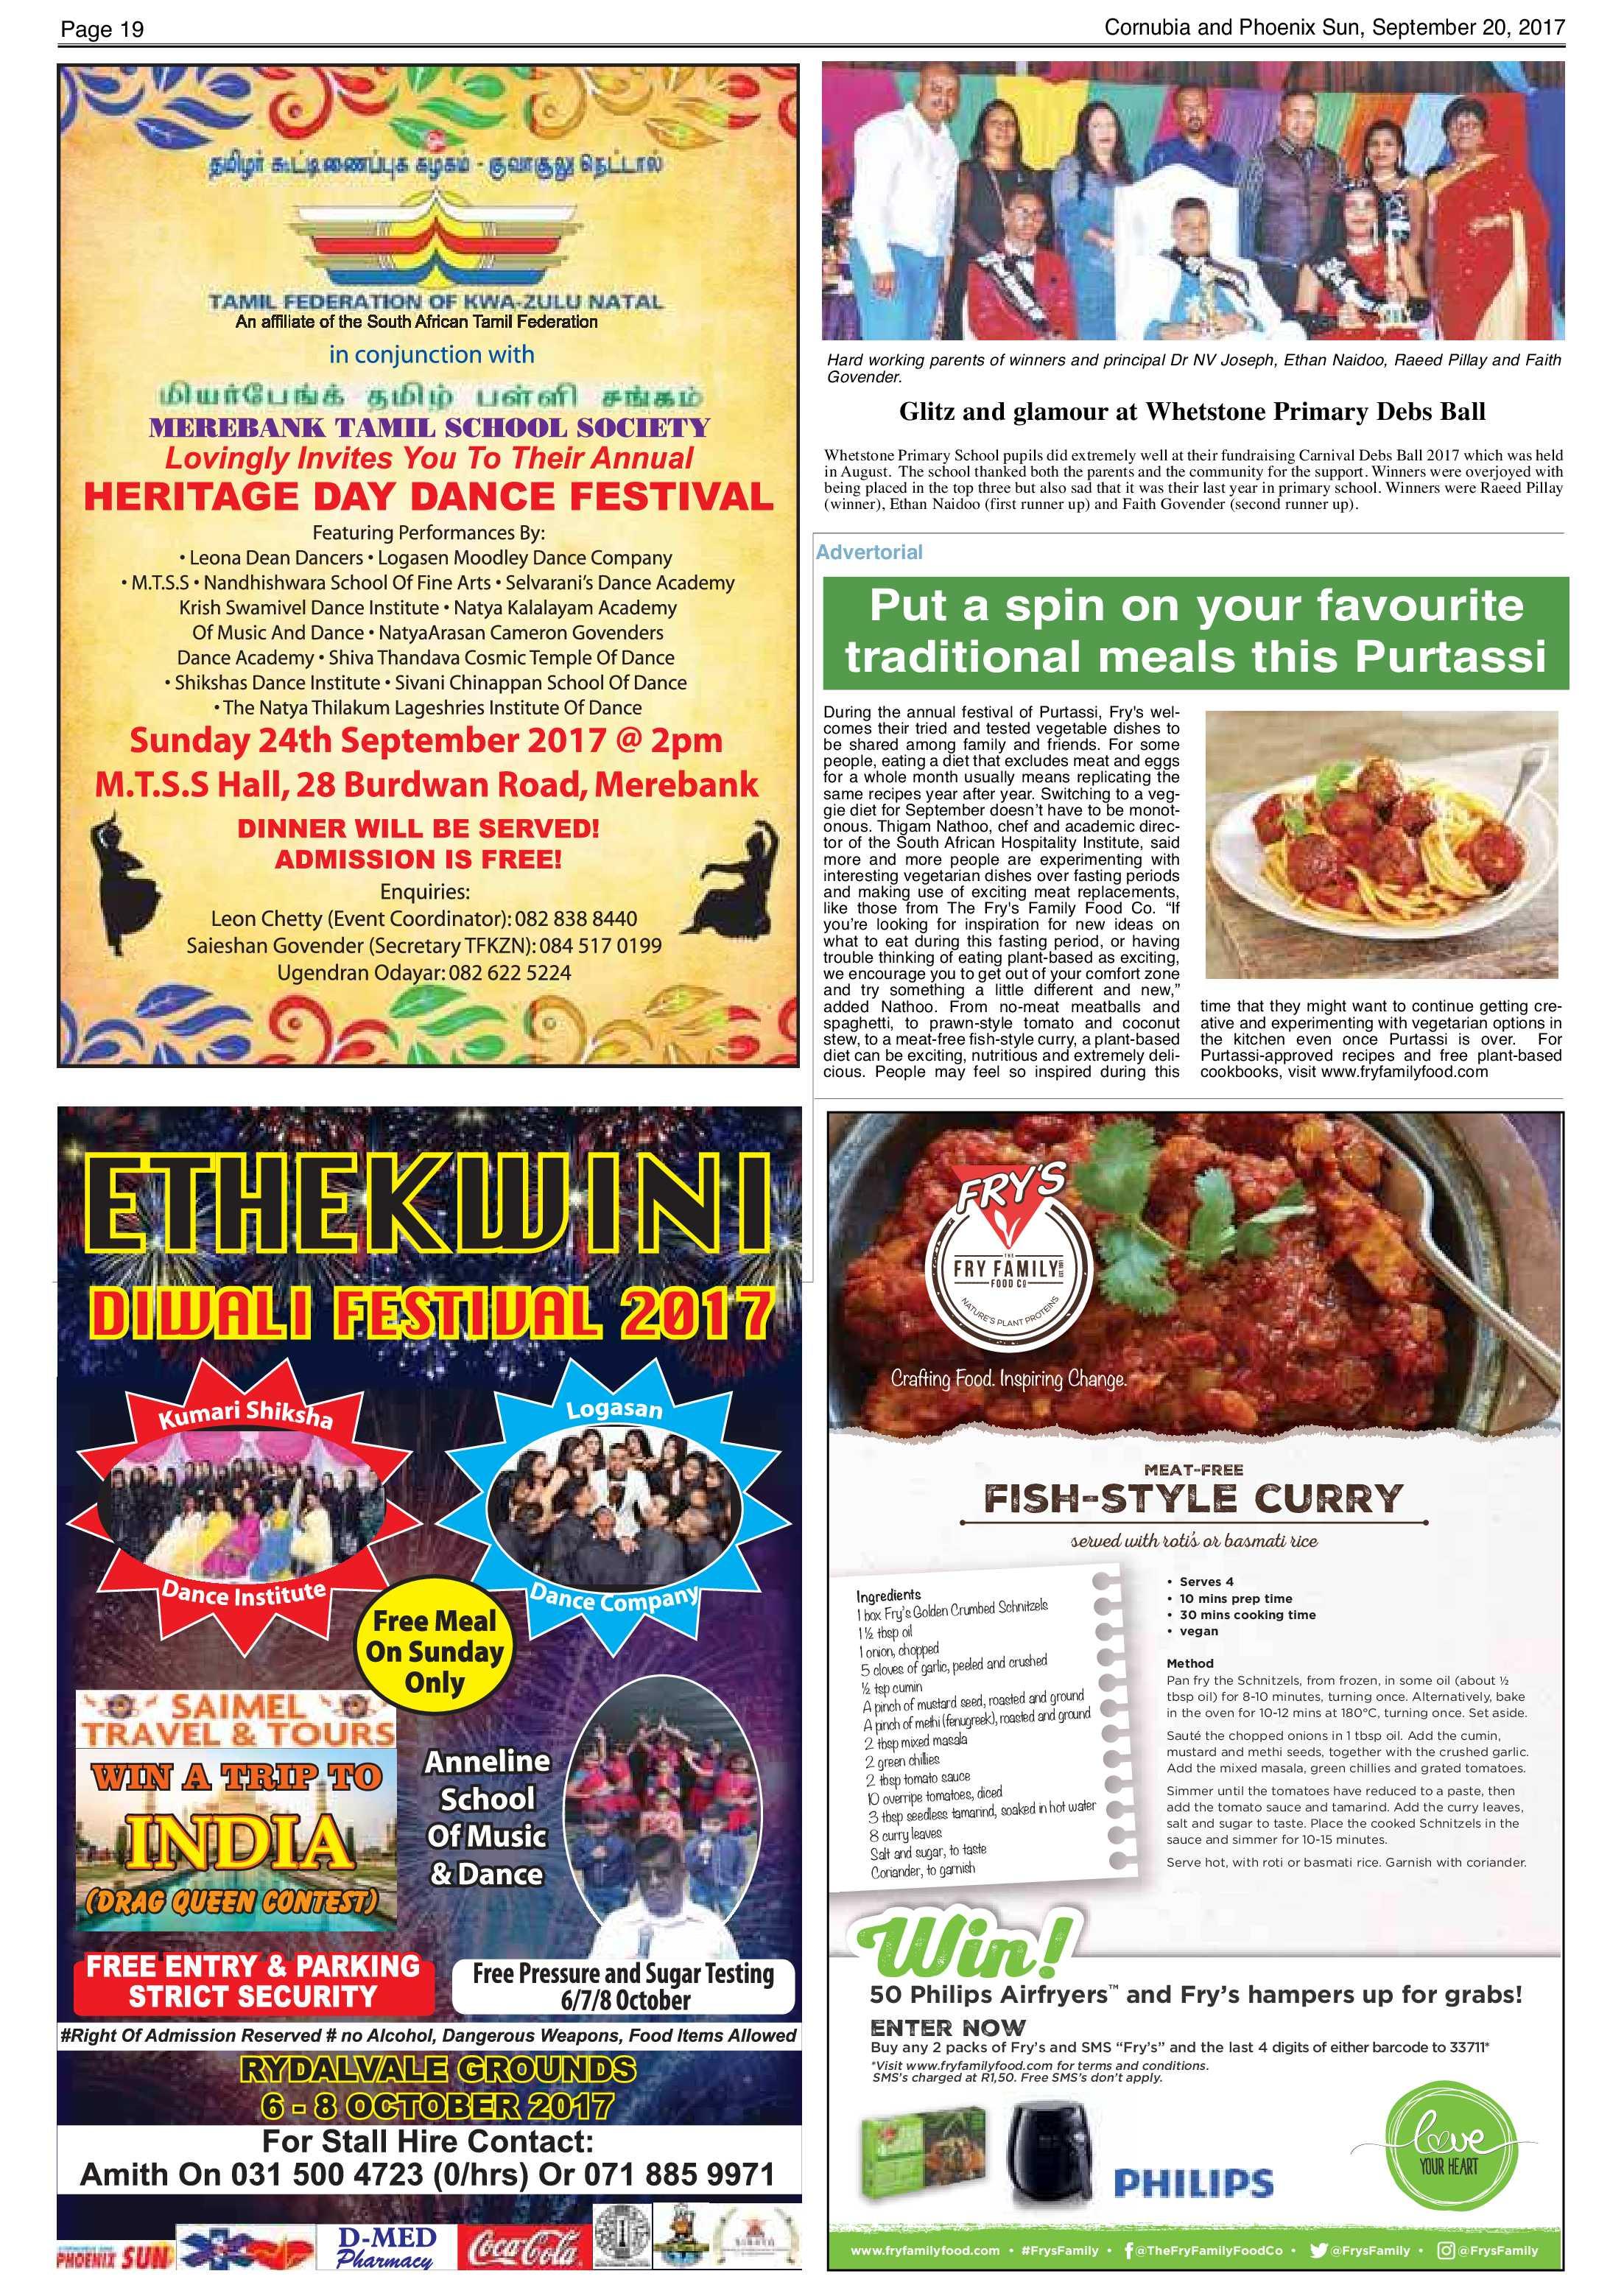 cornubia-phoenix-sun-september-20-epapers-page-19